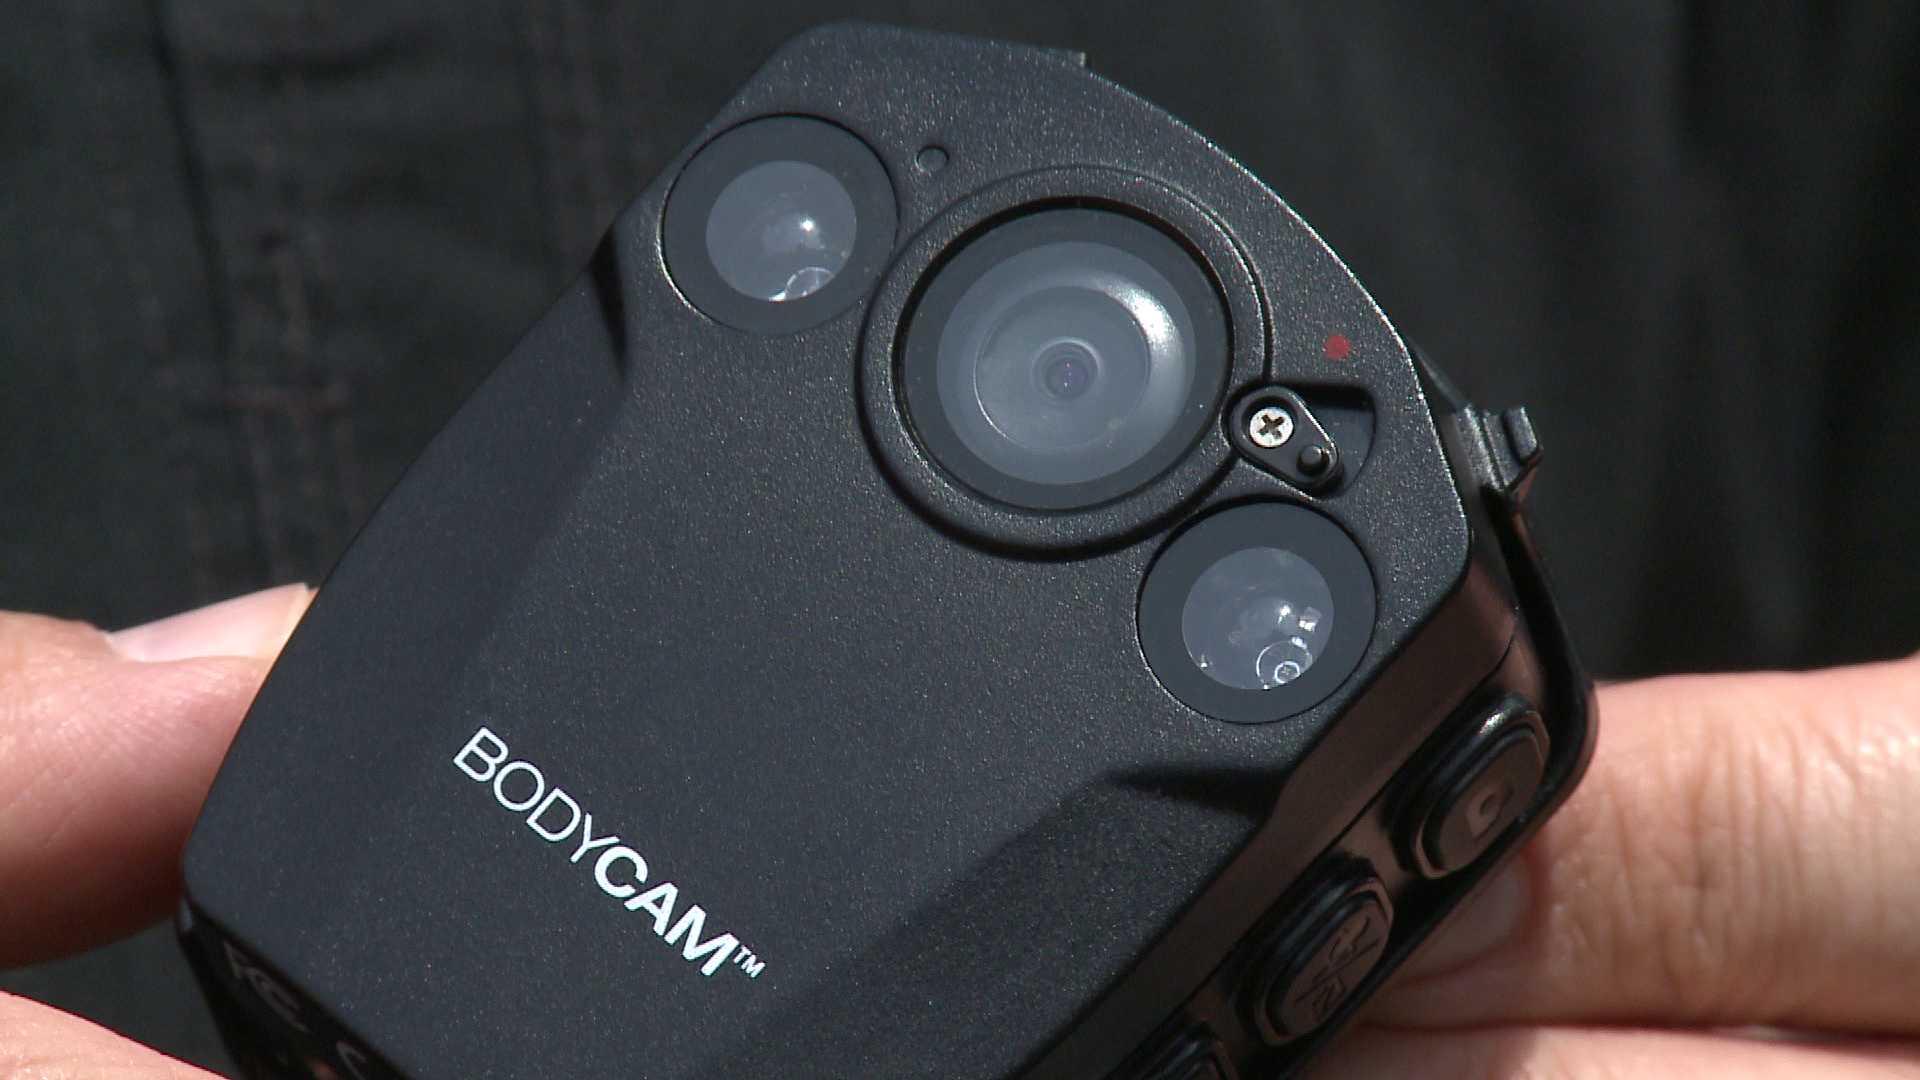 IllinoisChiefs Say Cost Still A Concern For Body Cameras